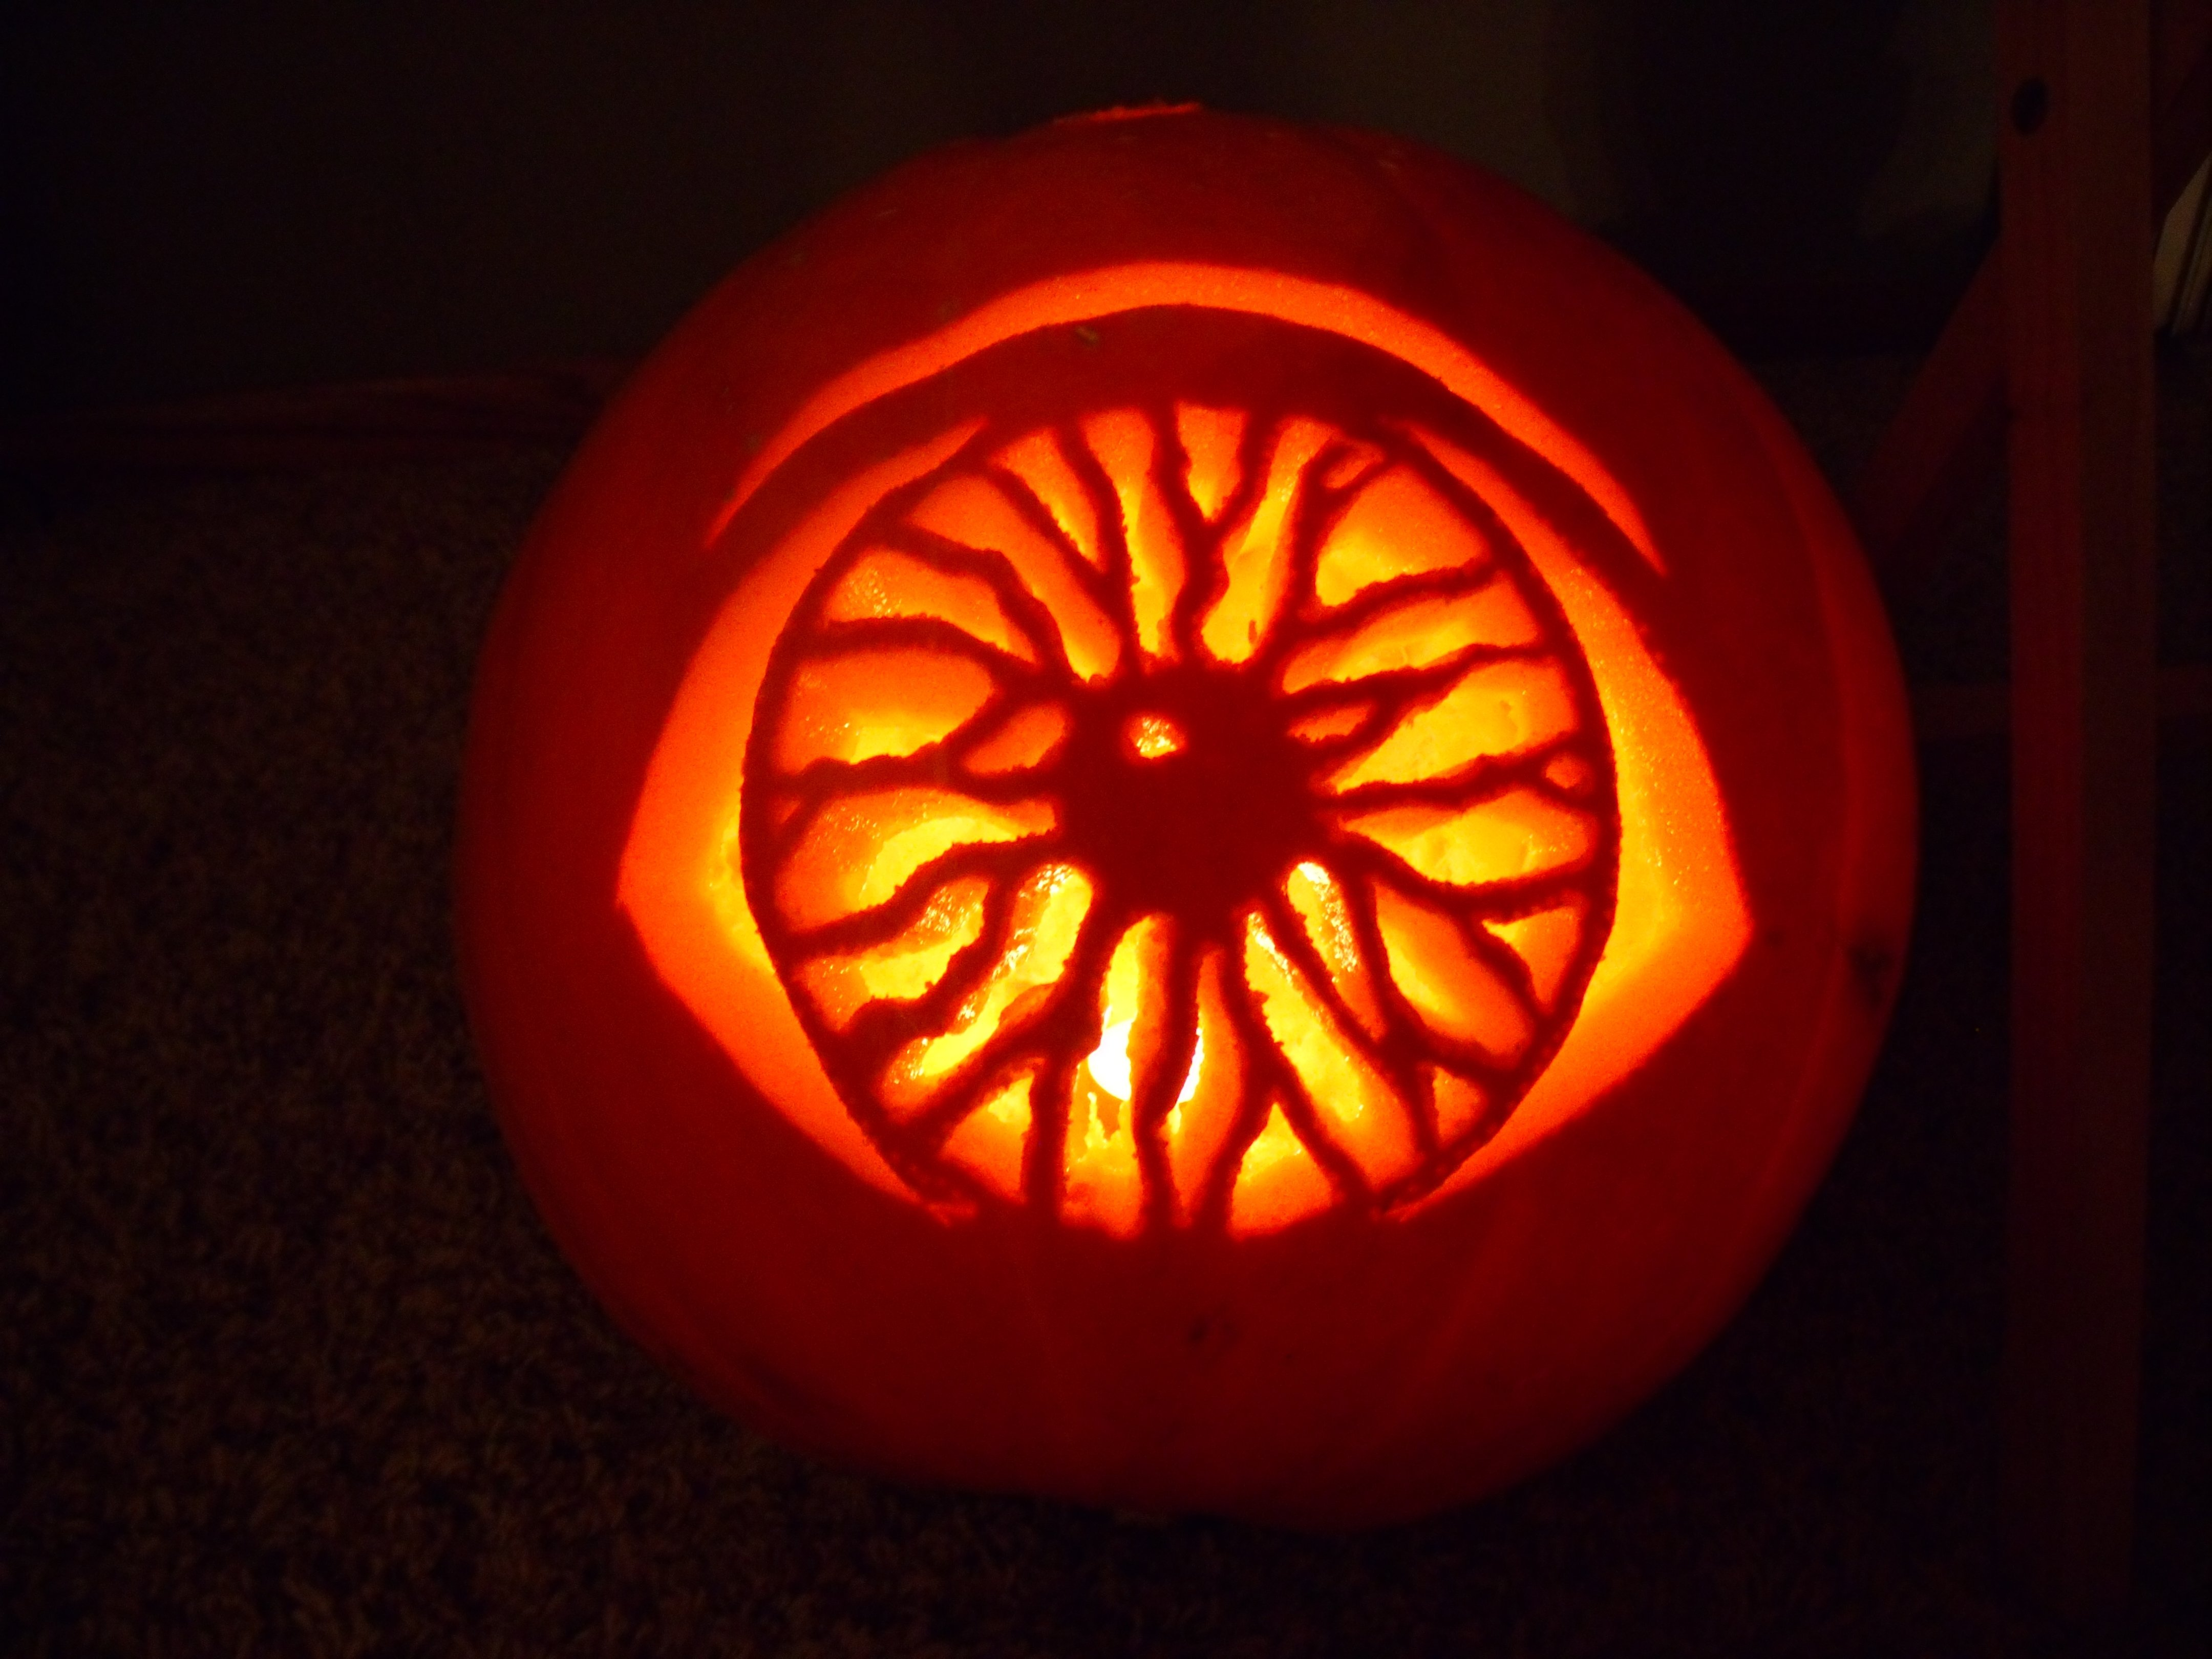 10 unique cool easy pumpkin carving ideas